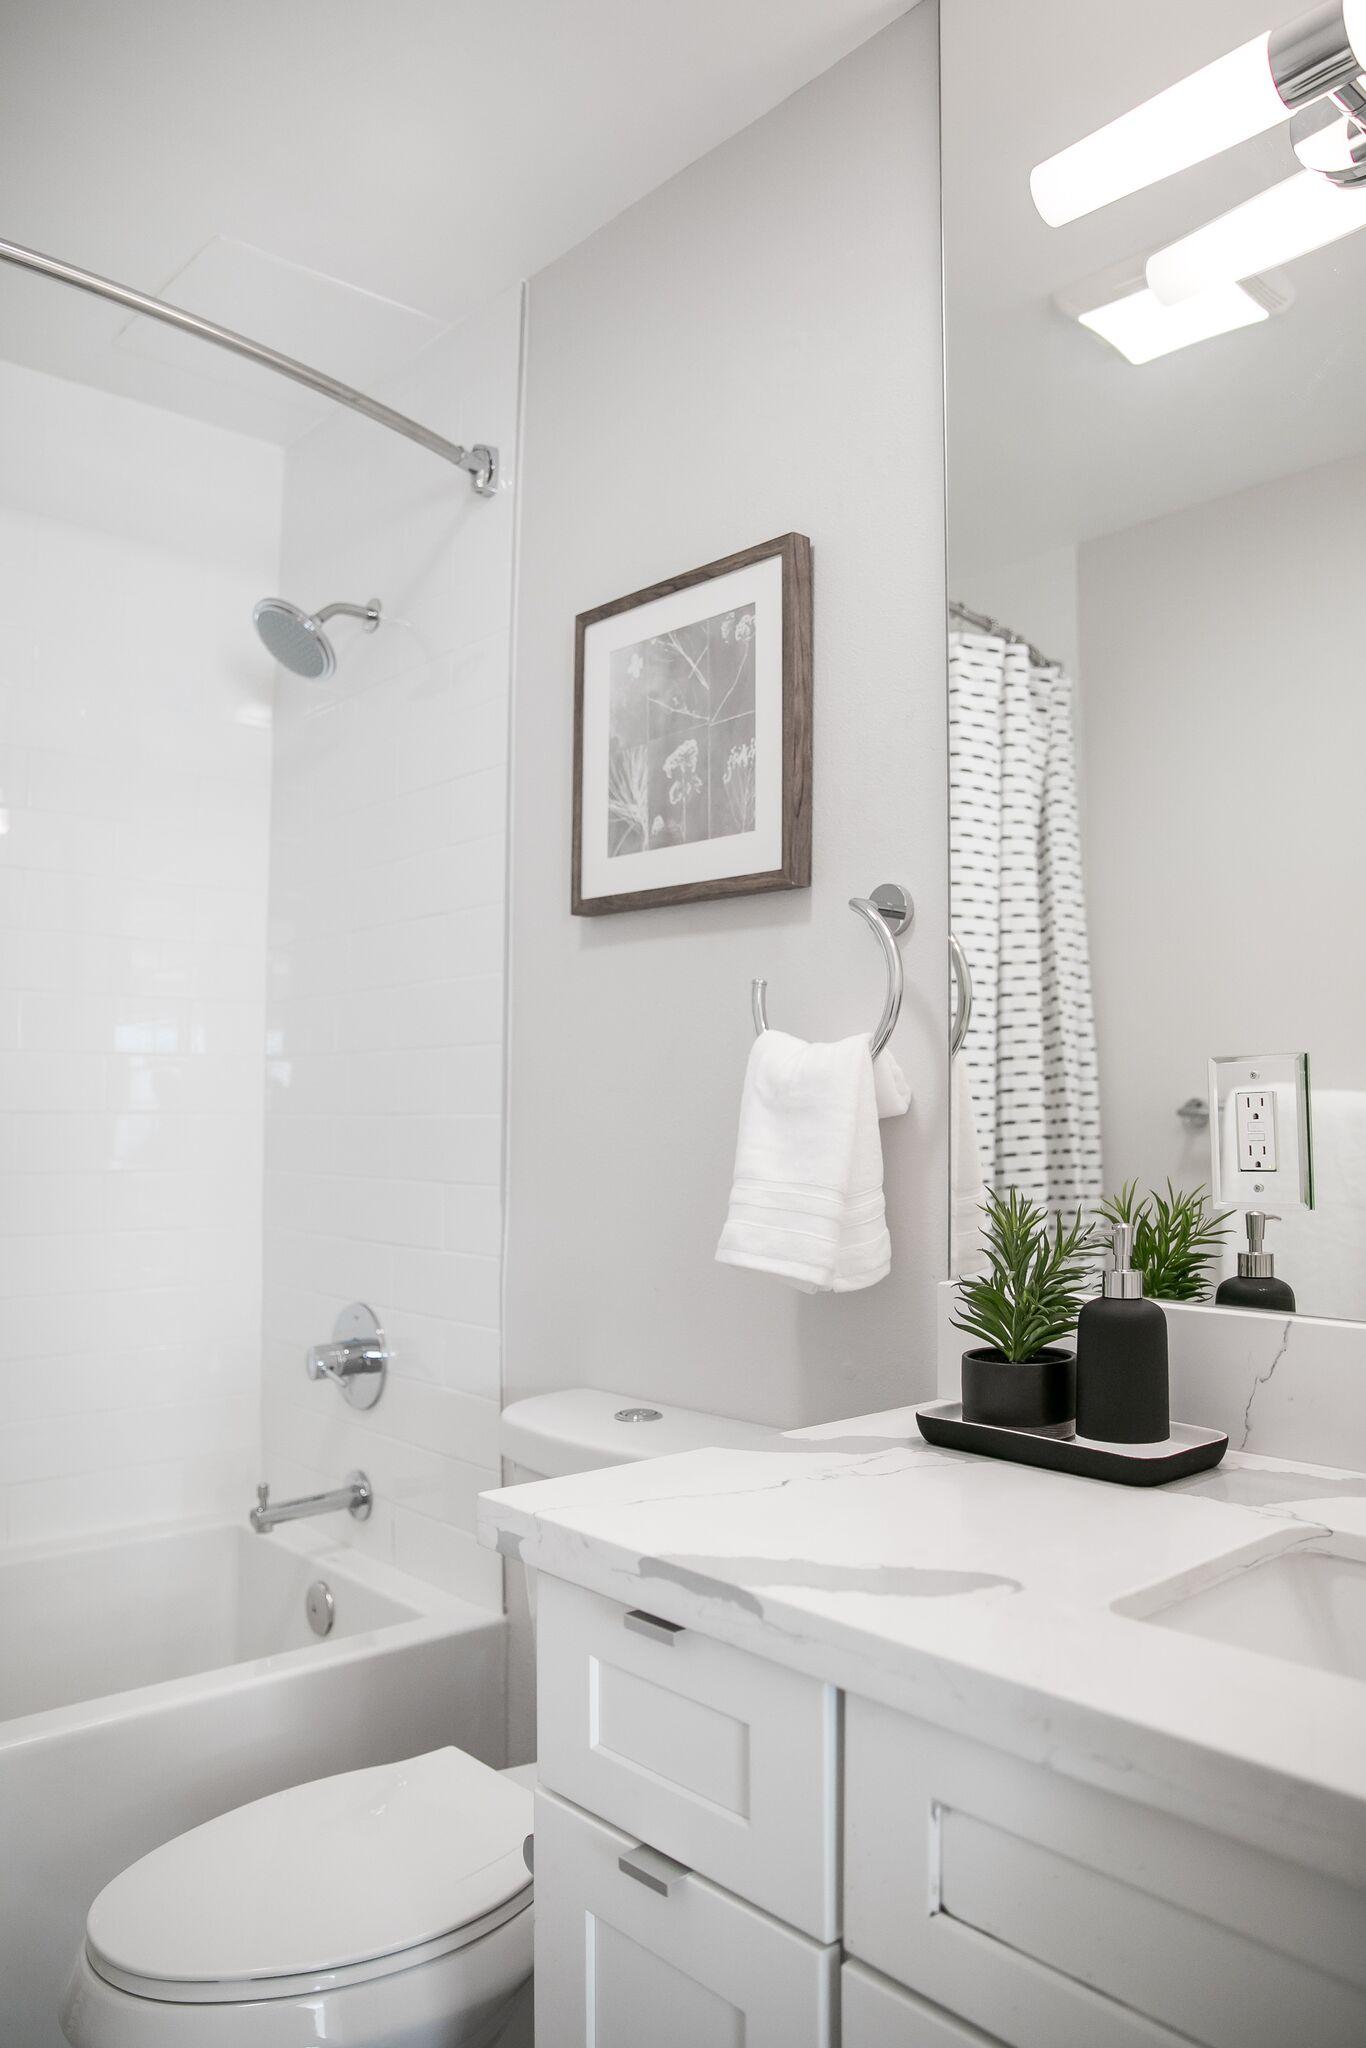 bathroom vertical - West 235th